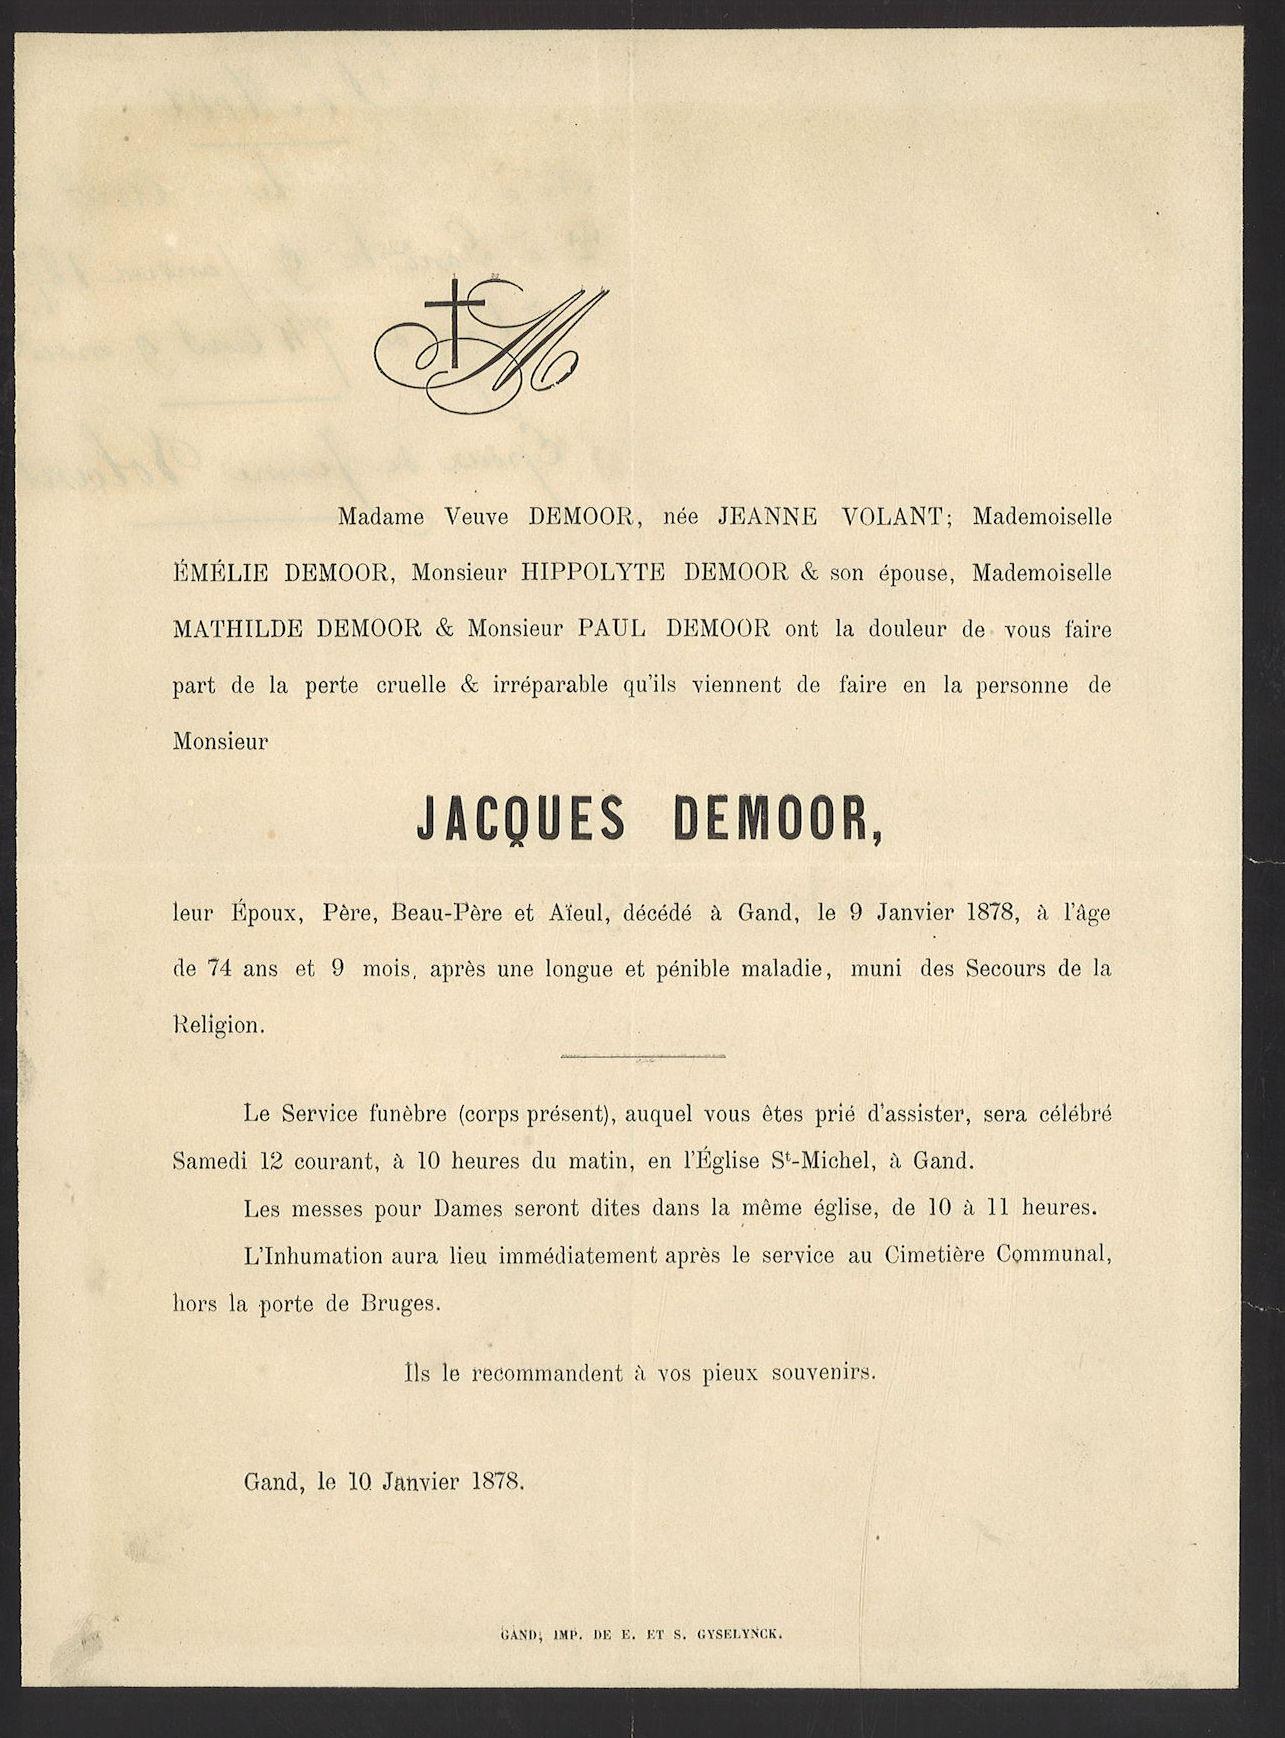 Jacques Demoor